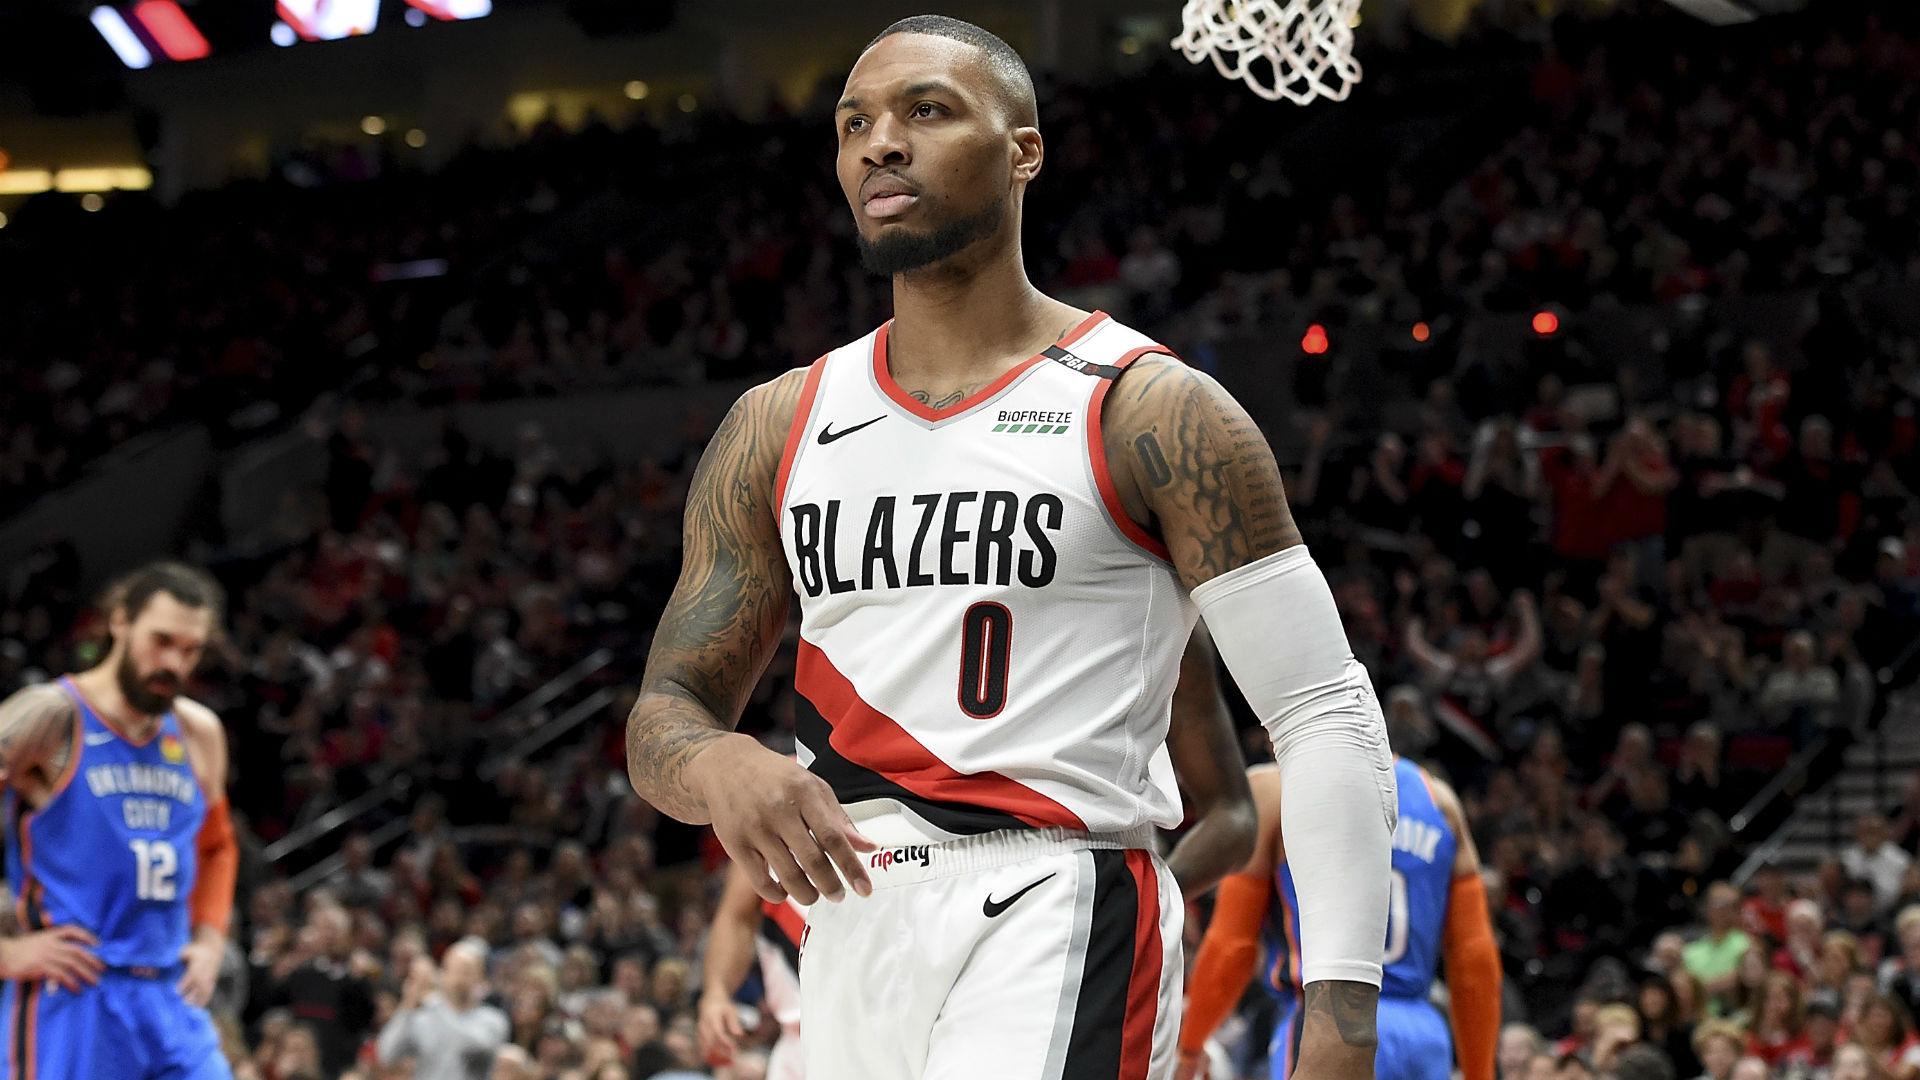 NBA Playoffs 2019: Damian Lillard says 'it's good to get ...